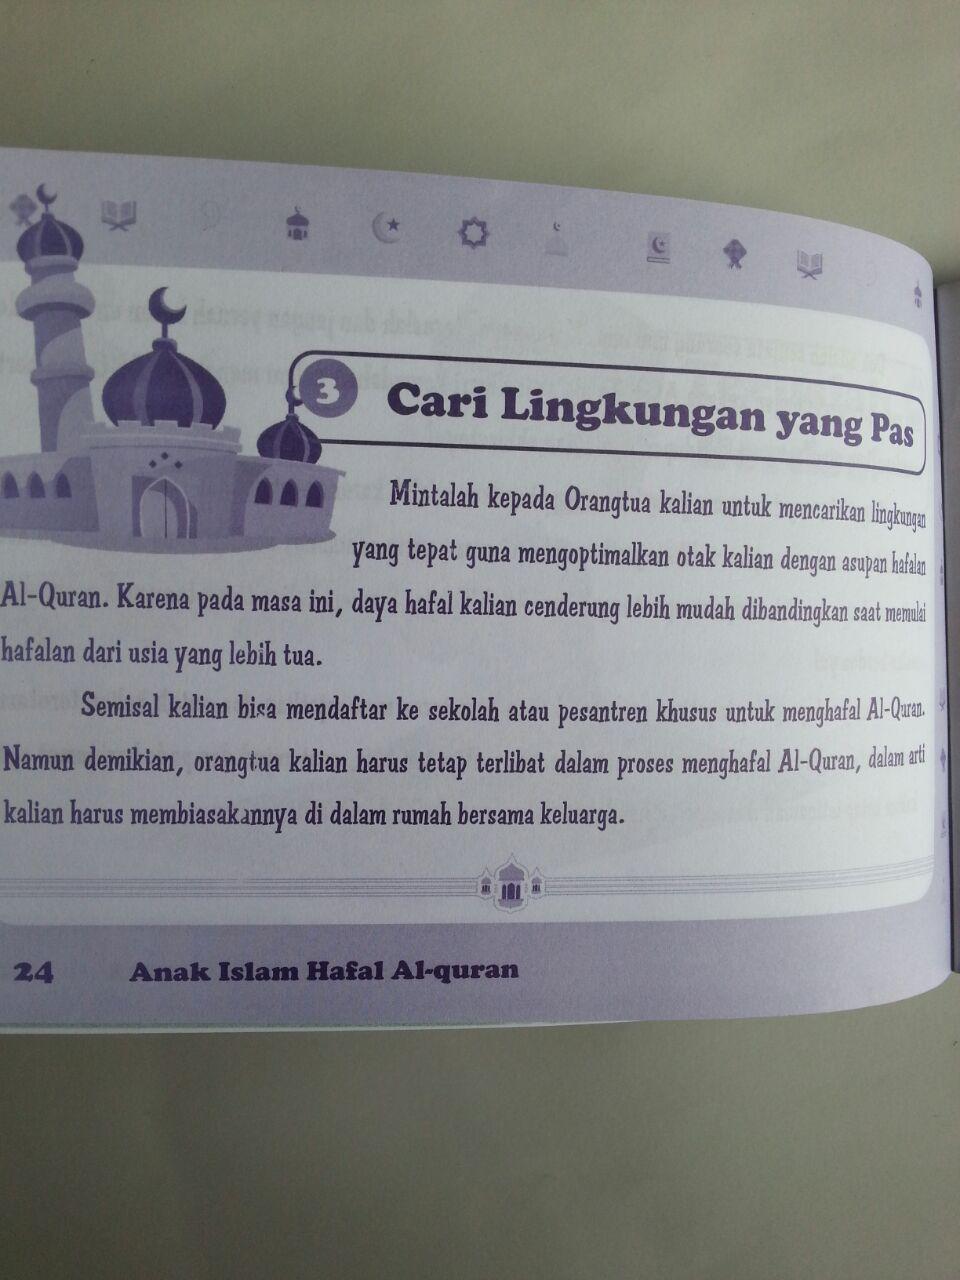 Buku Anak Islam Hafal Al-Quran Sejak Dini isi